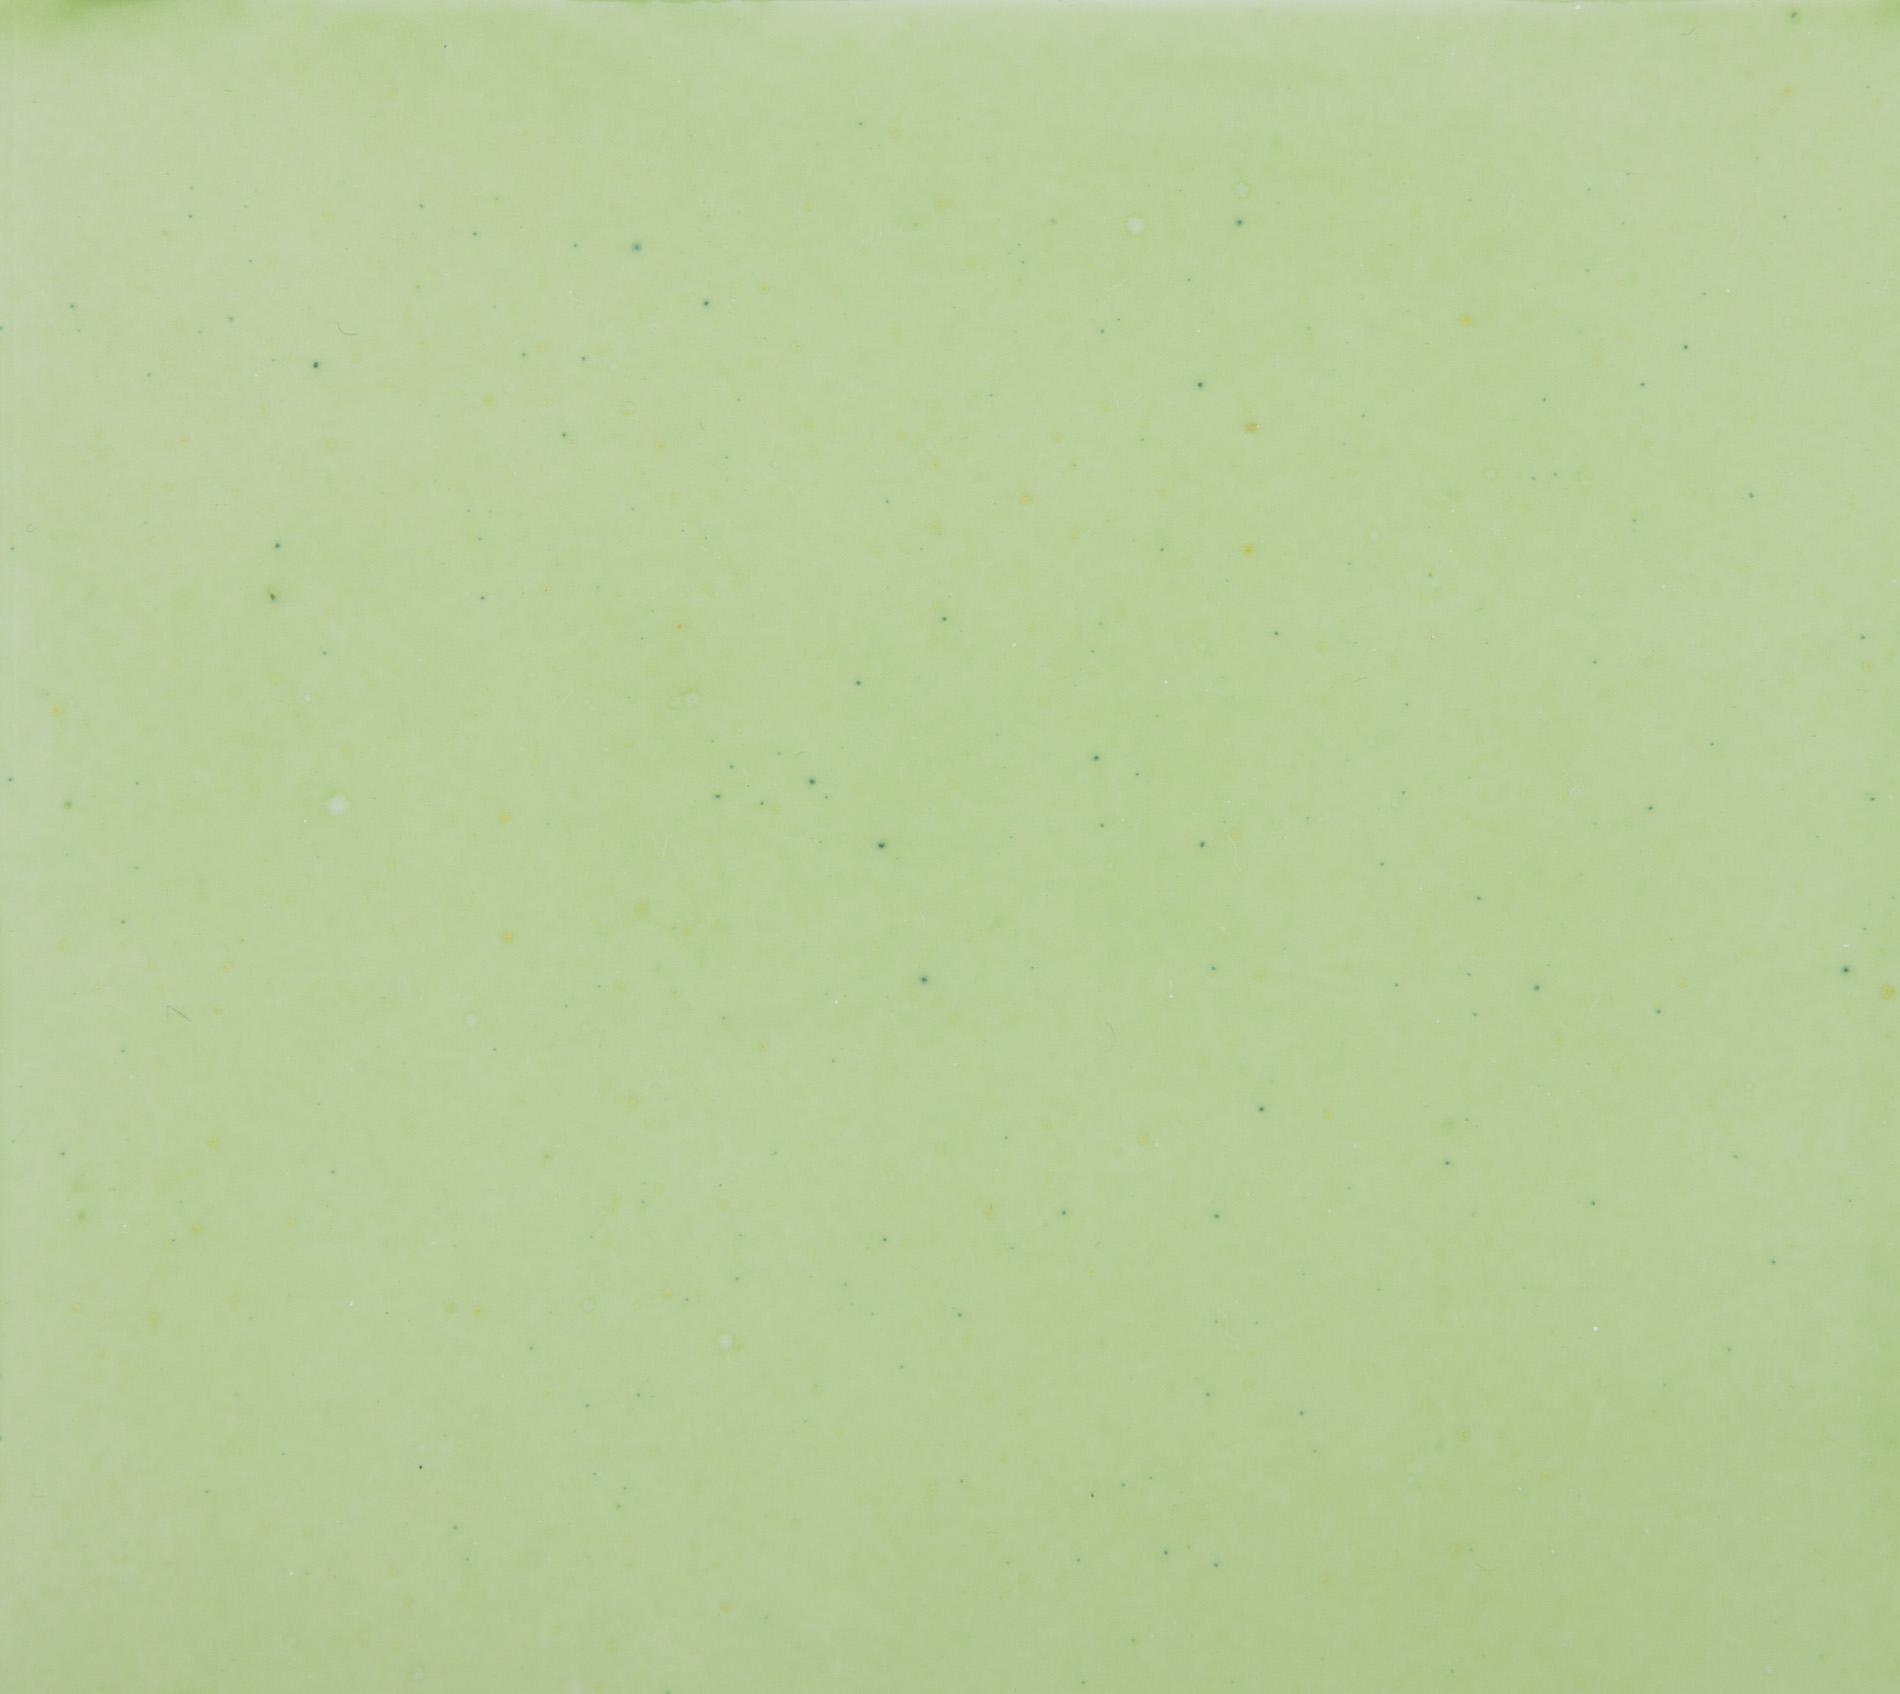 Peinture Vert Amande Peinture Vert Amande Meilleures